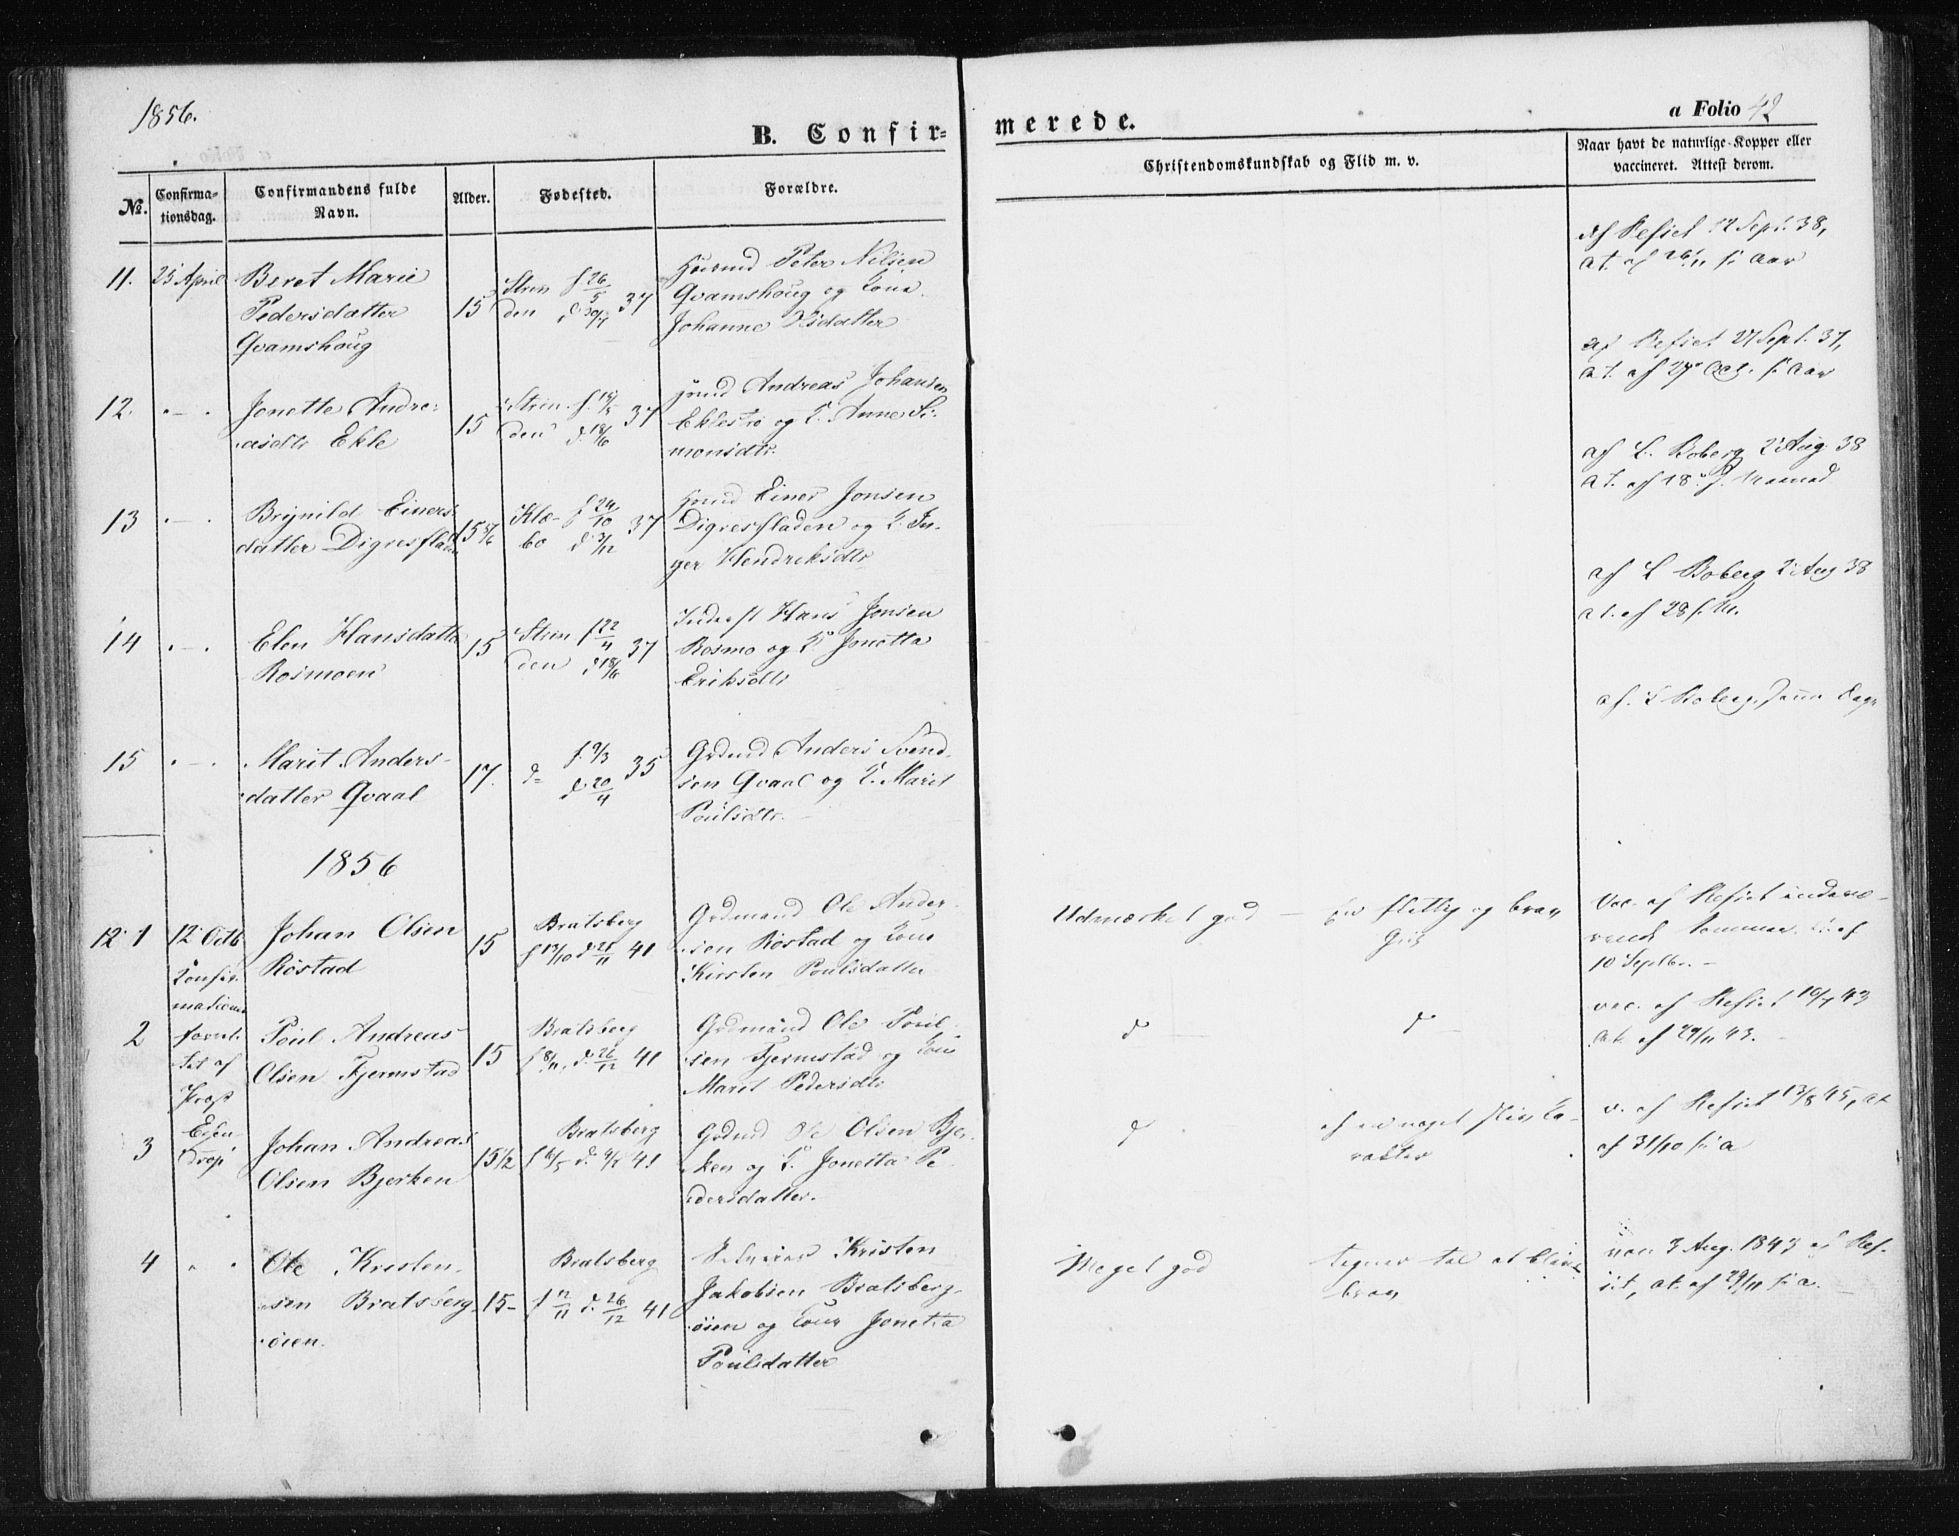 SAT, Ministerialprotokoller, klokkerbøker og fødselsregistre - Sør-Trøndelag, 608/L0332: Parish register (official) no. 608A01, 1848-1861, p. 42